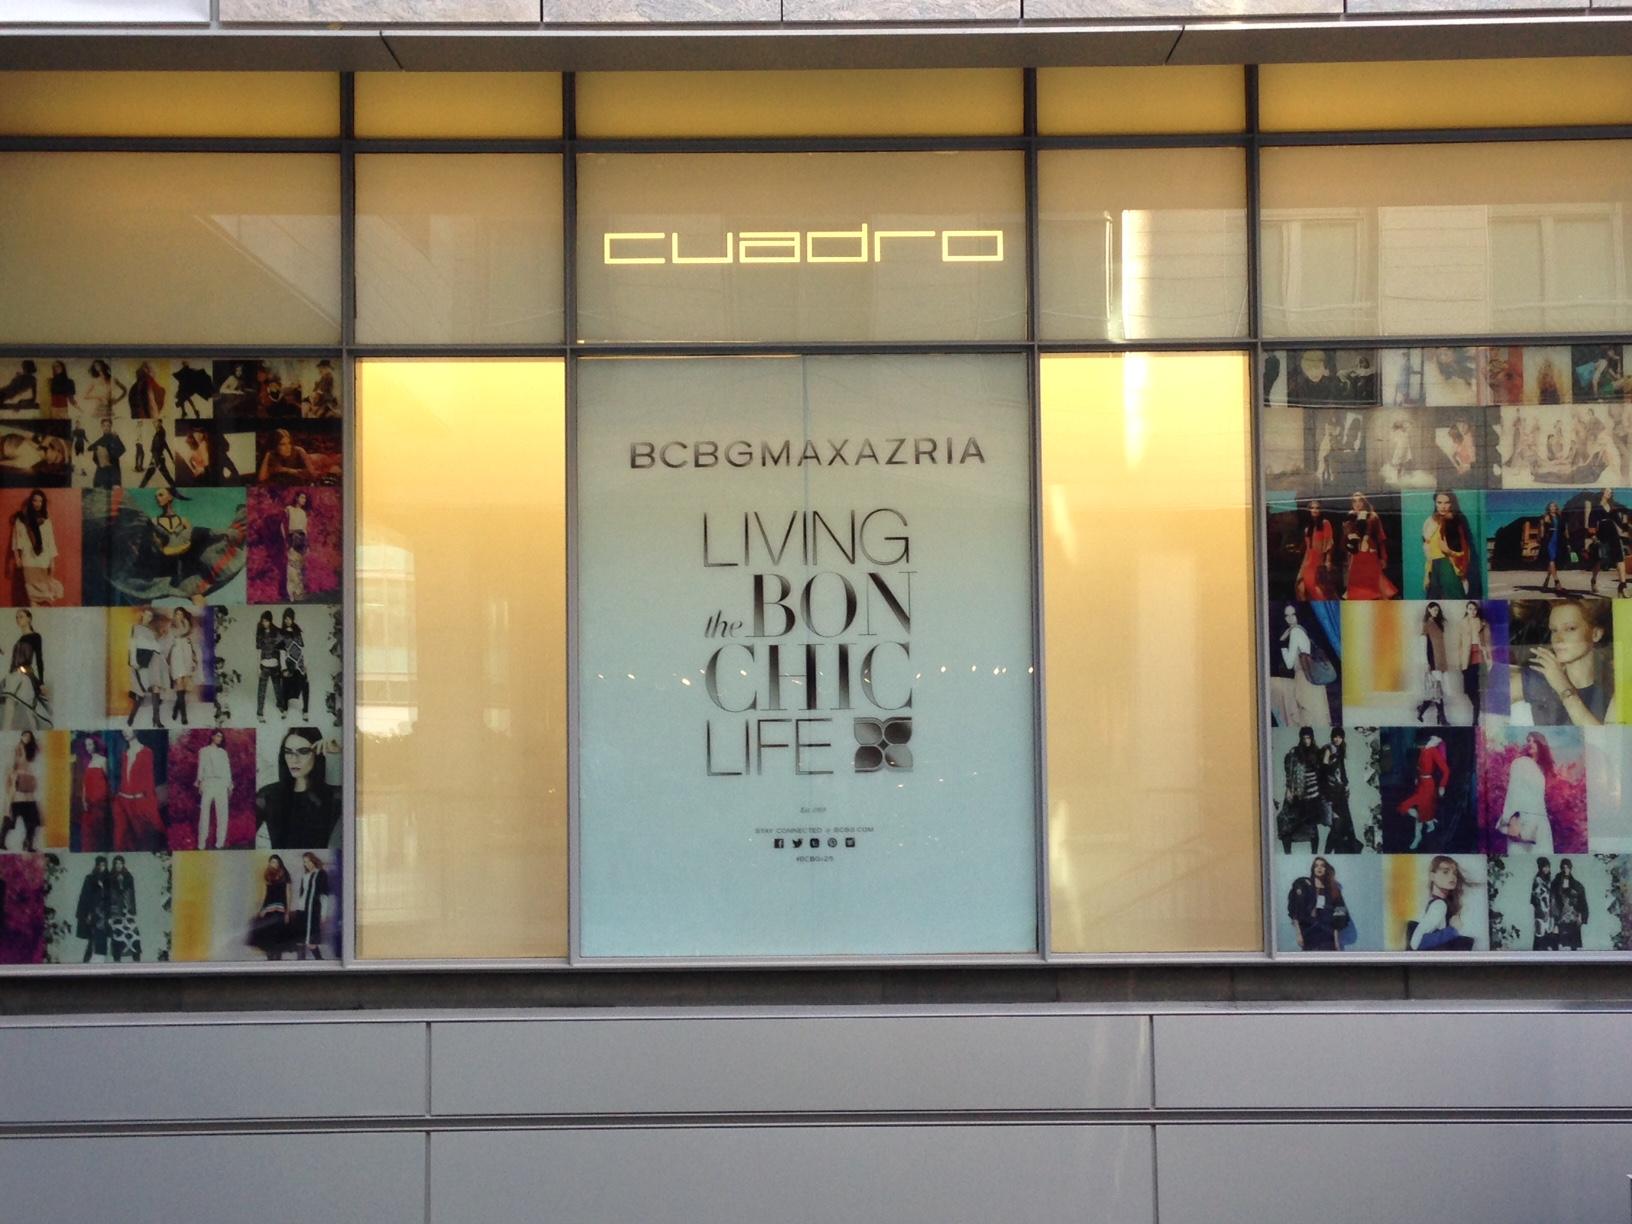 Cuadro Gallery